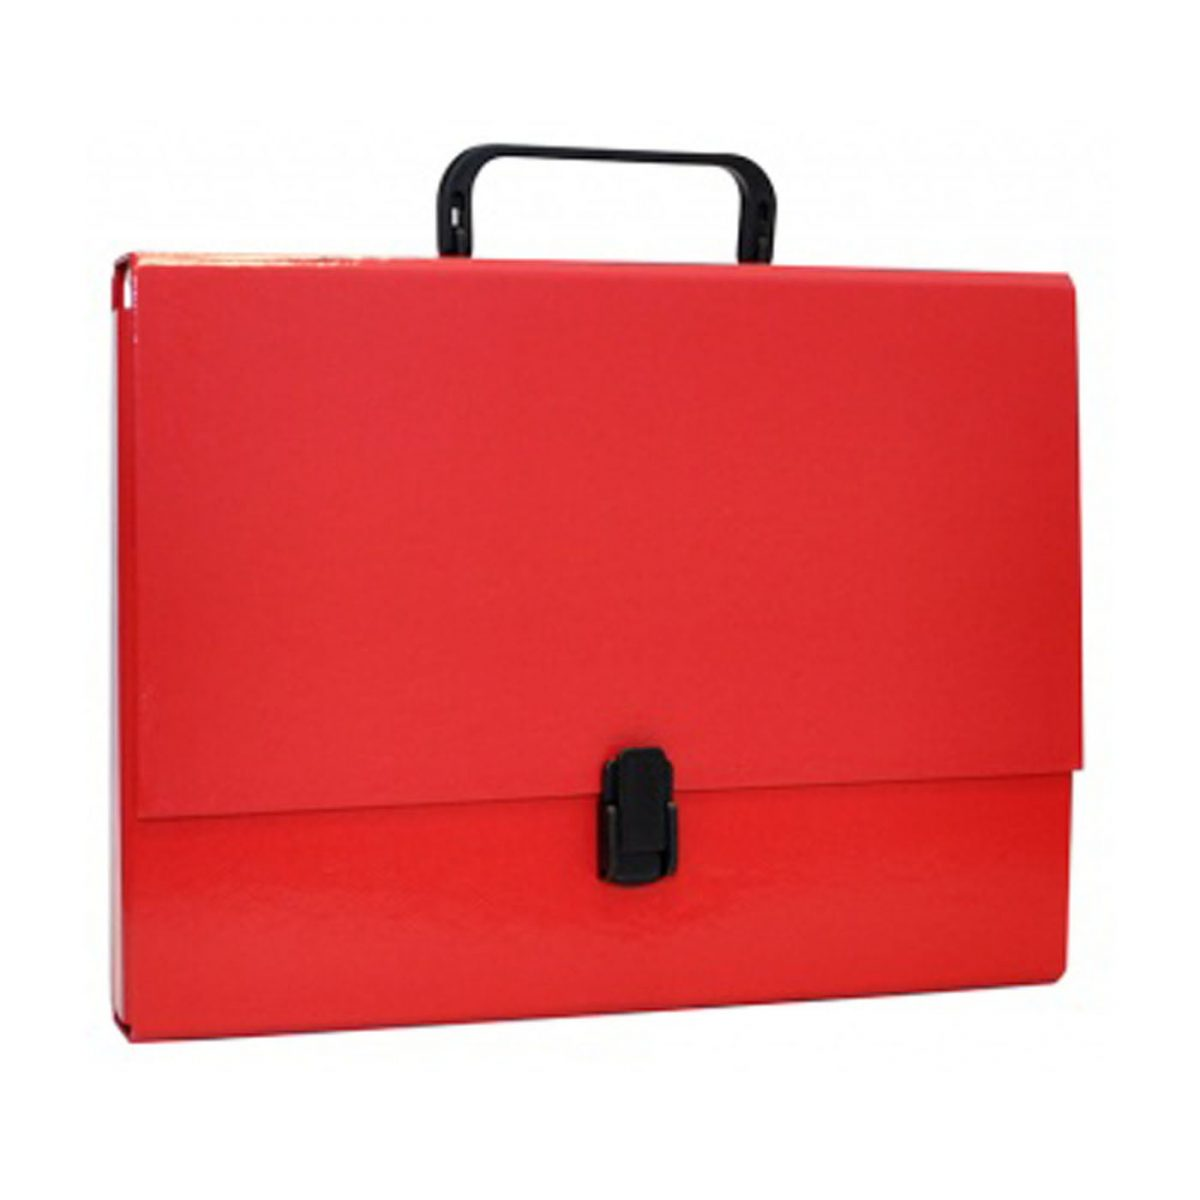 Servieta din carton laminat, A4/5cm, cu inchidere si maner, Office Products - rosu